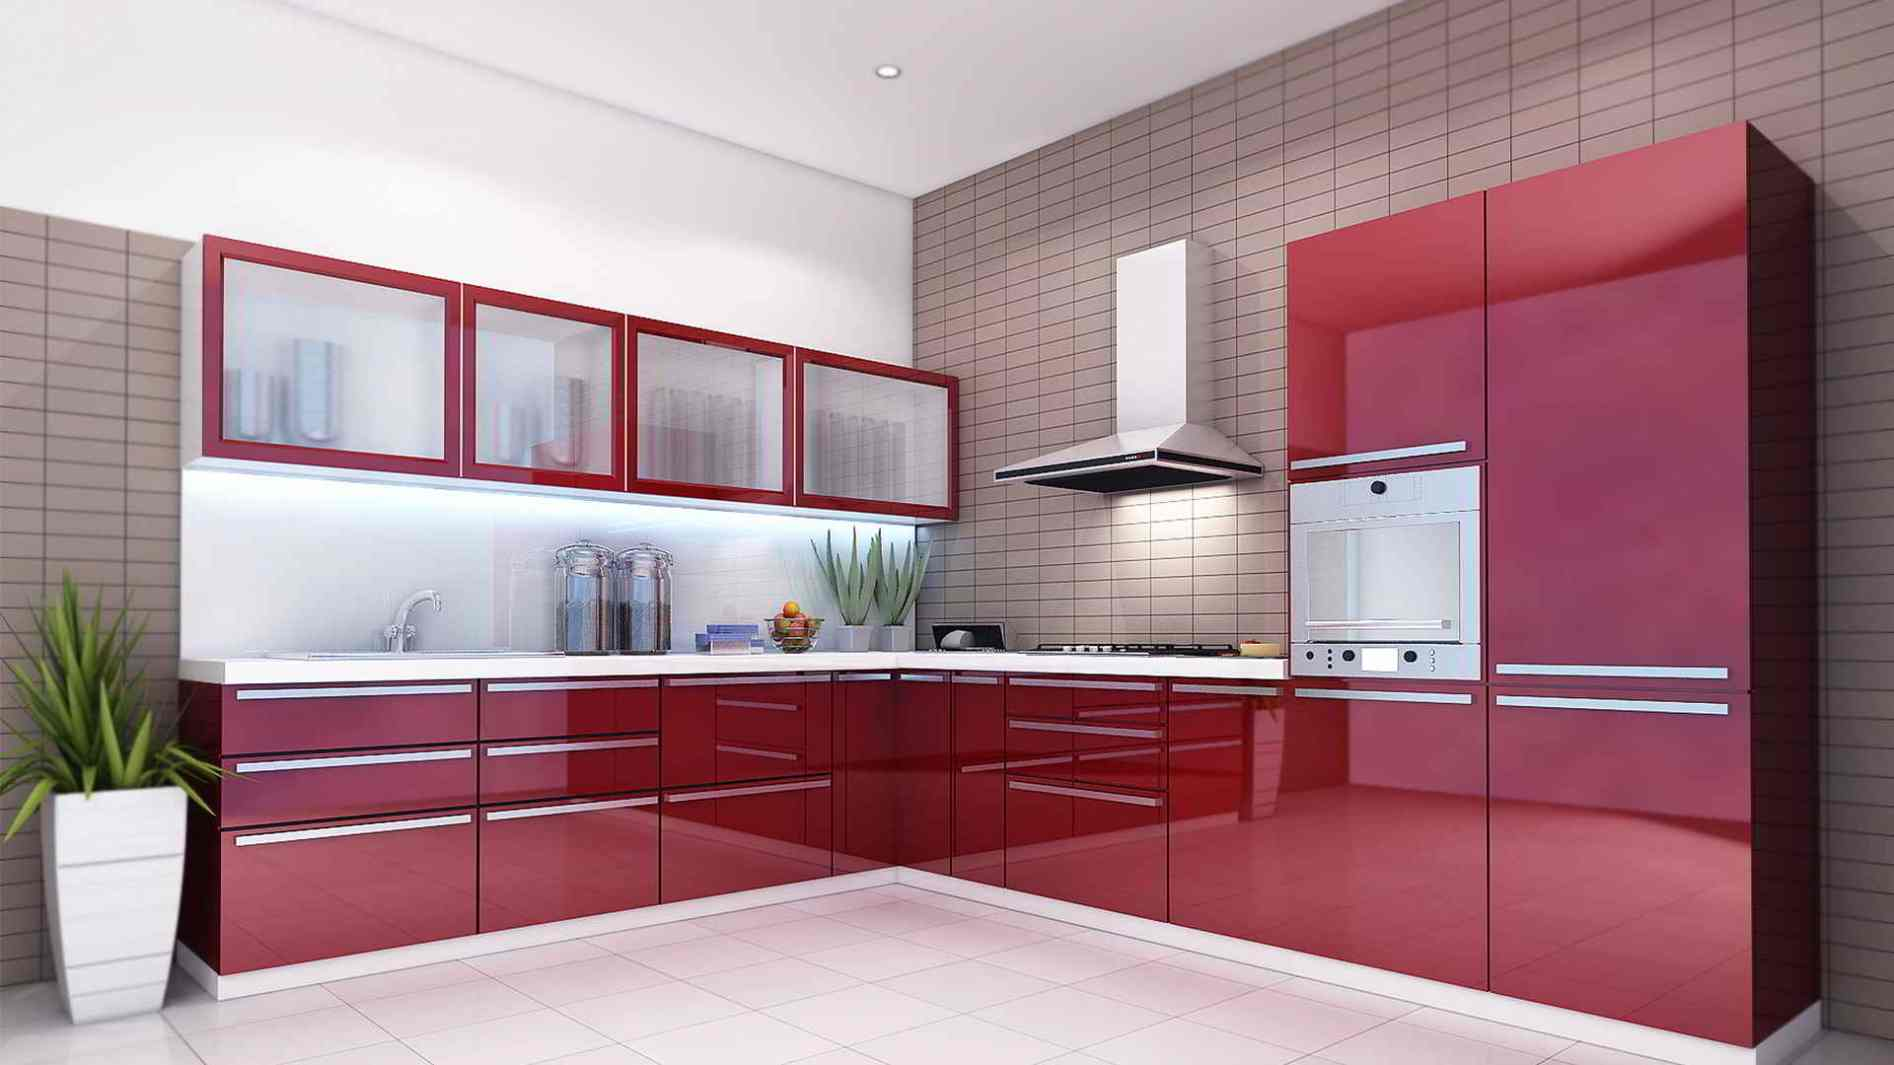 Modular Kitchen Chimneys and Hoods Range -- Fantasykitchens | PRLog